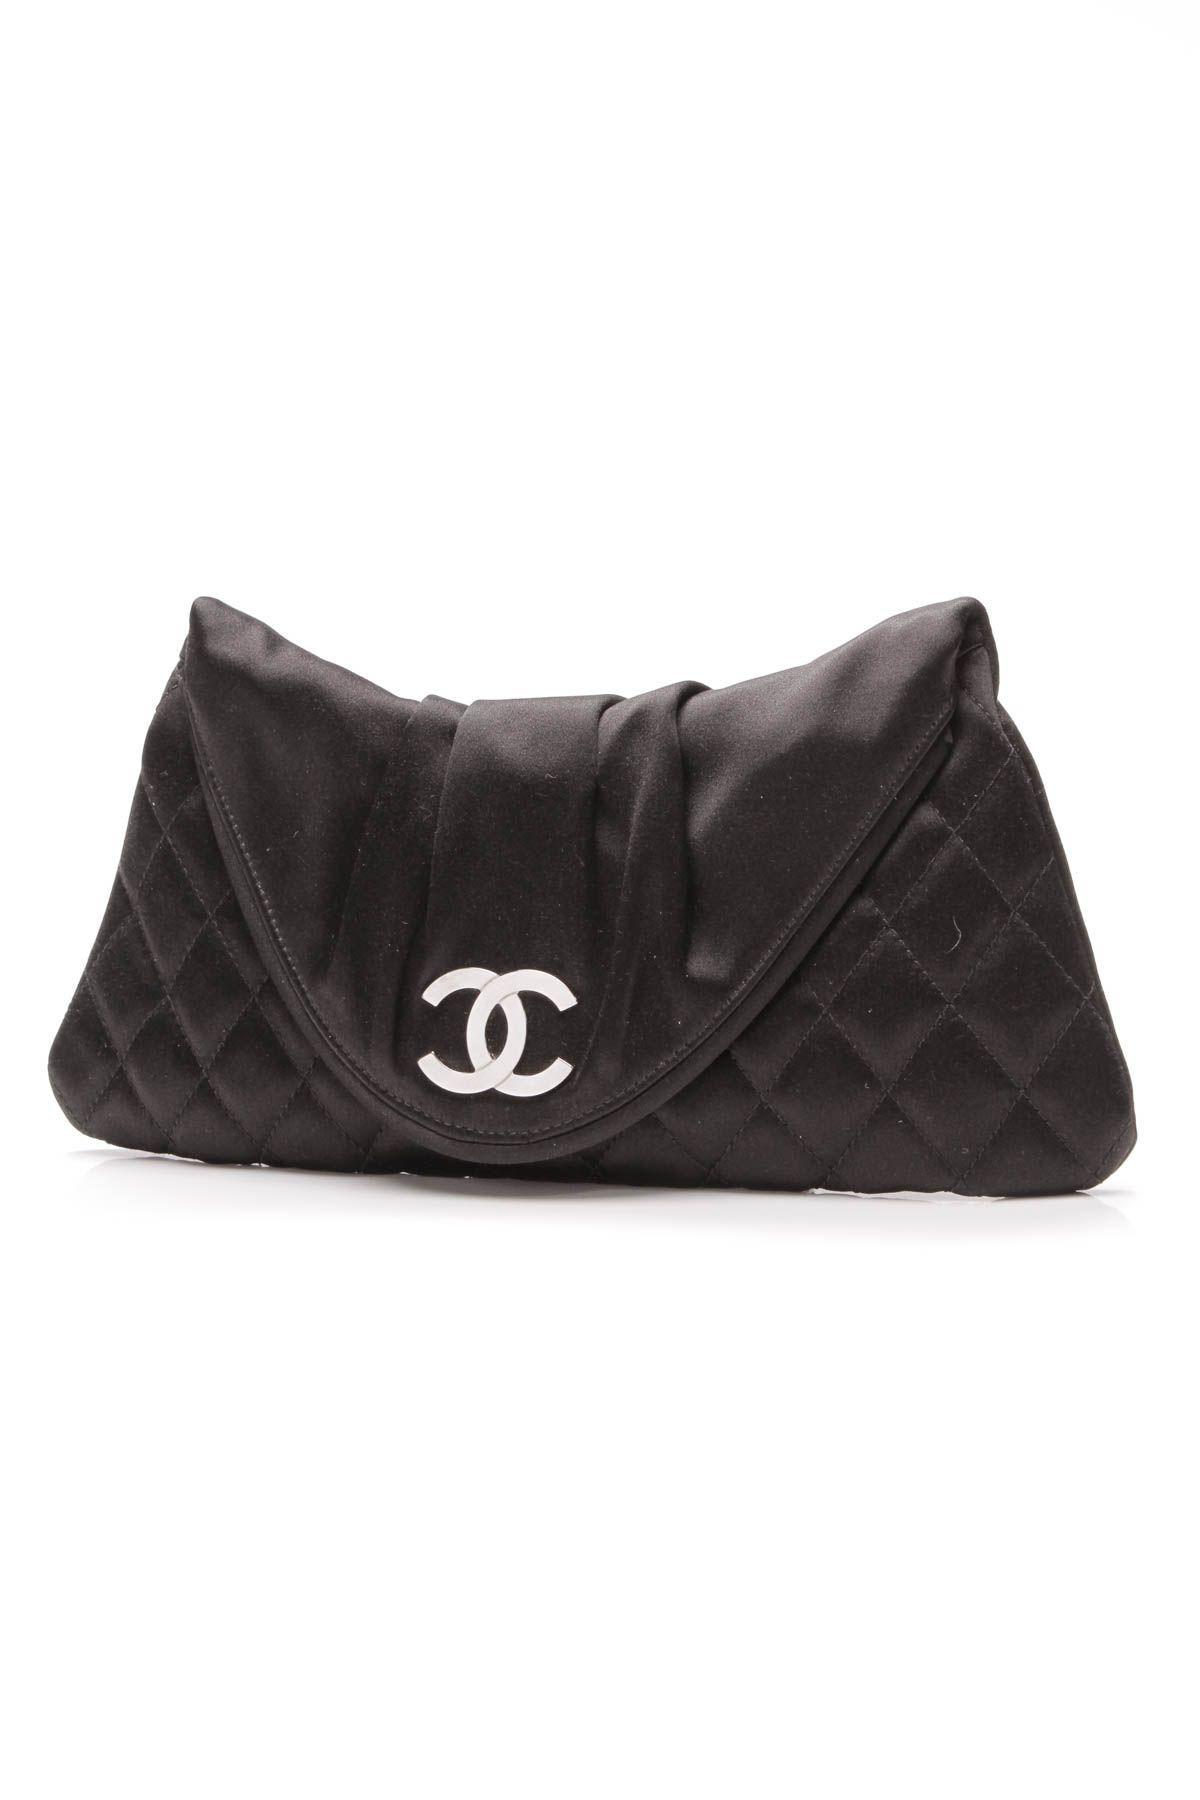 9a6a97bcaad4 Chanel Half Moon Clutch Bag  blackclutchbag